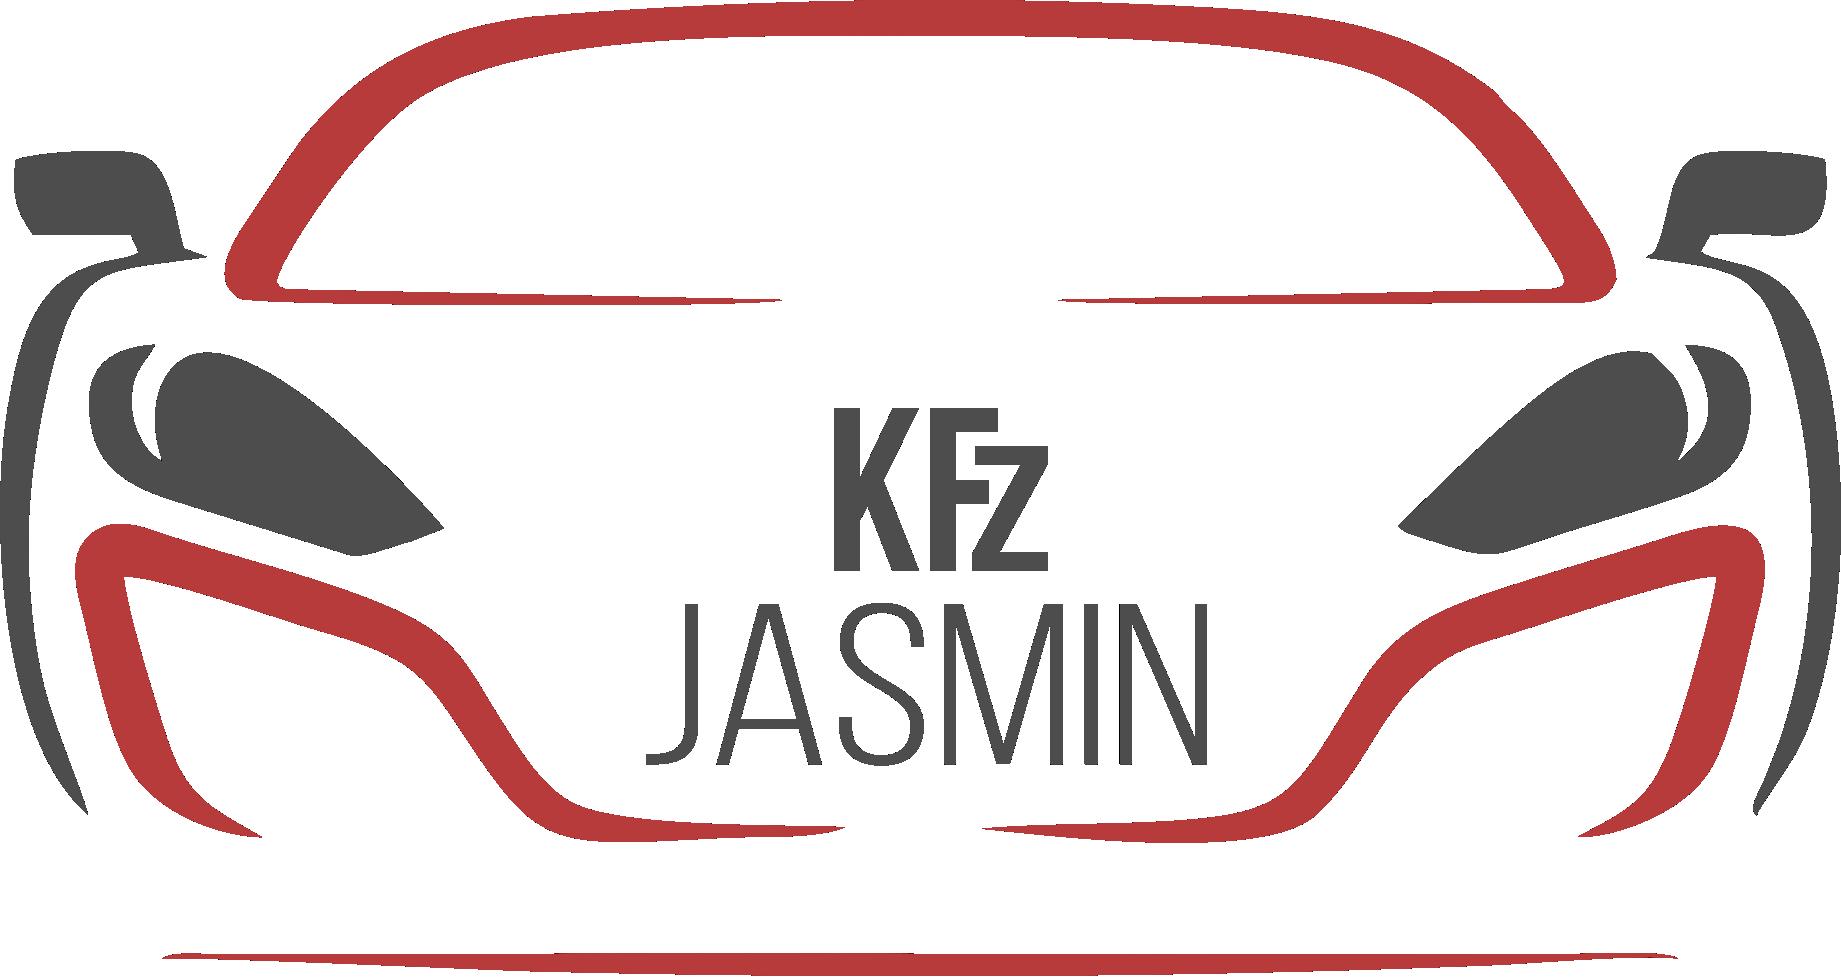 KFZ Jasmin